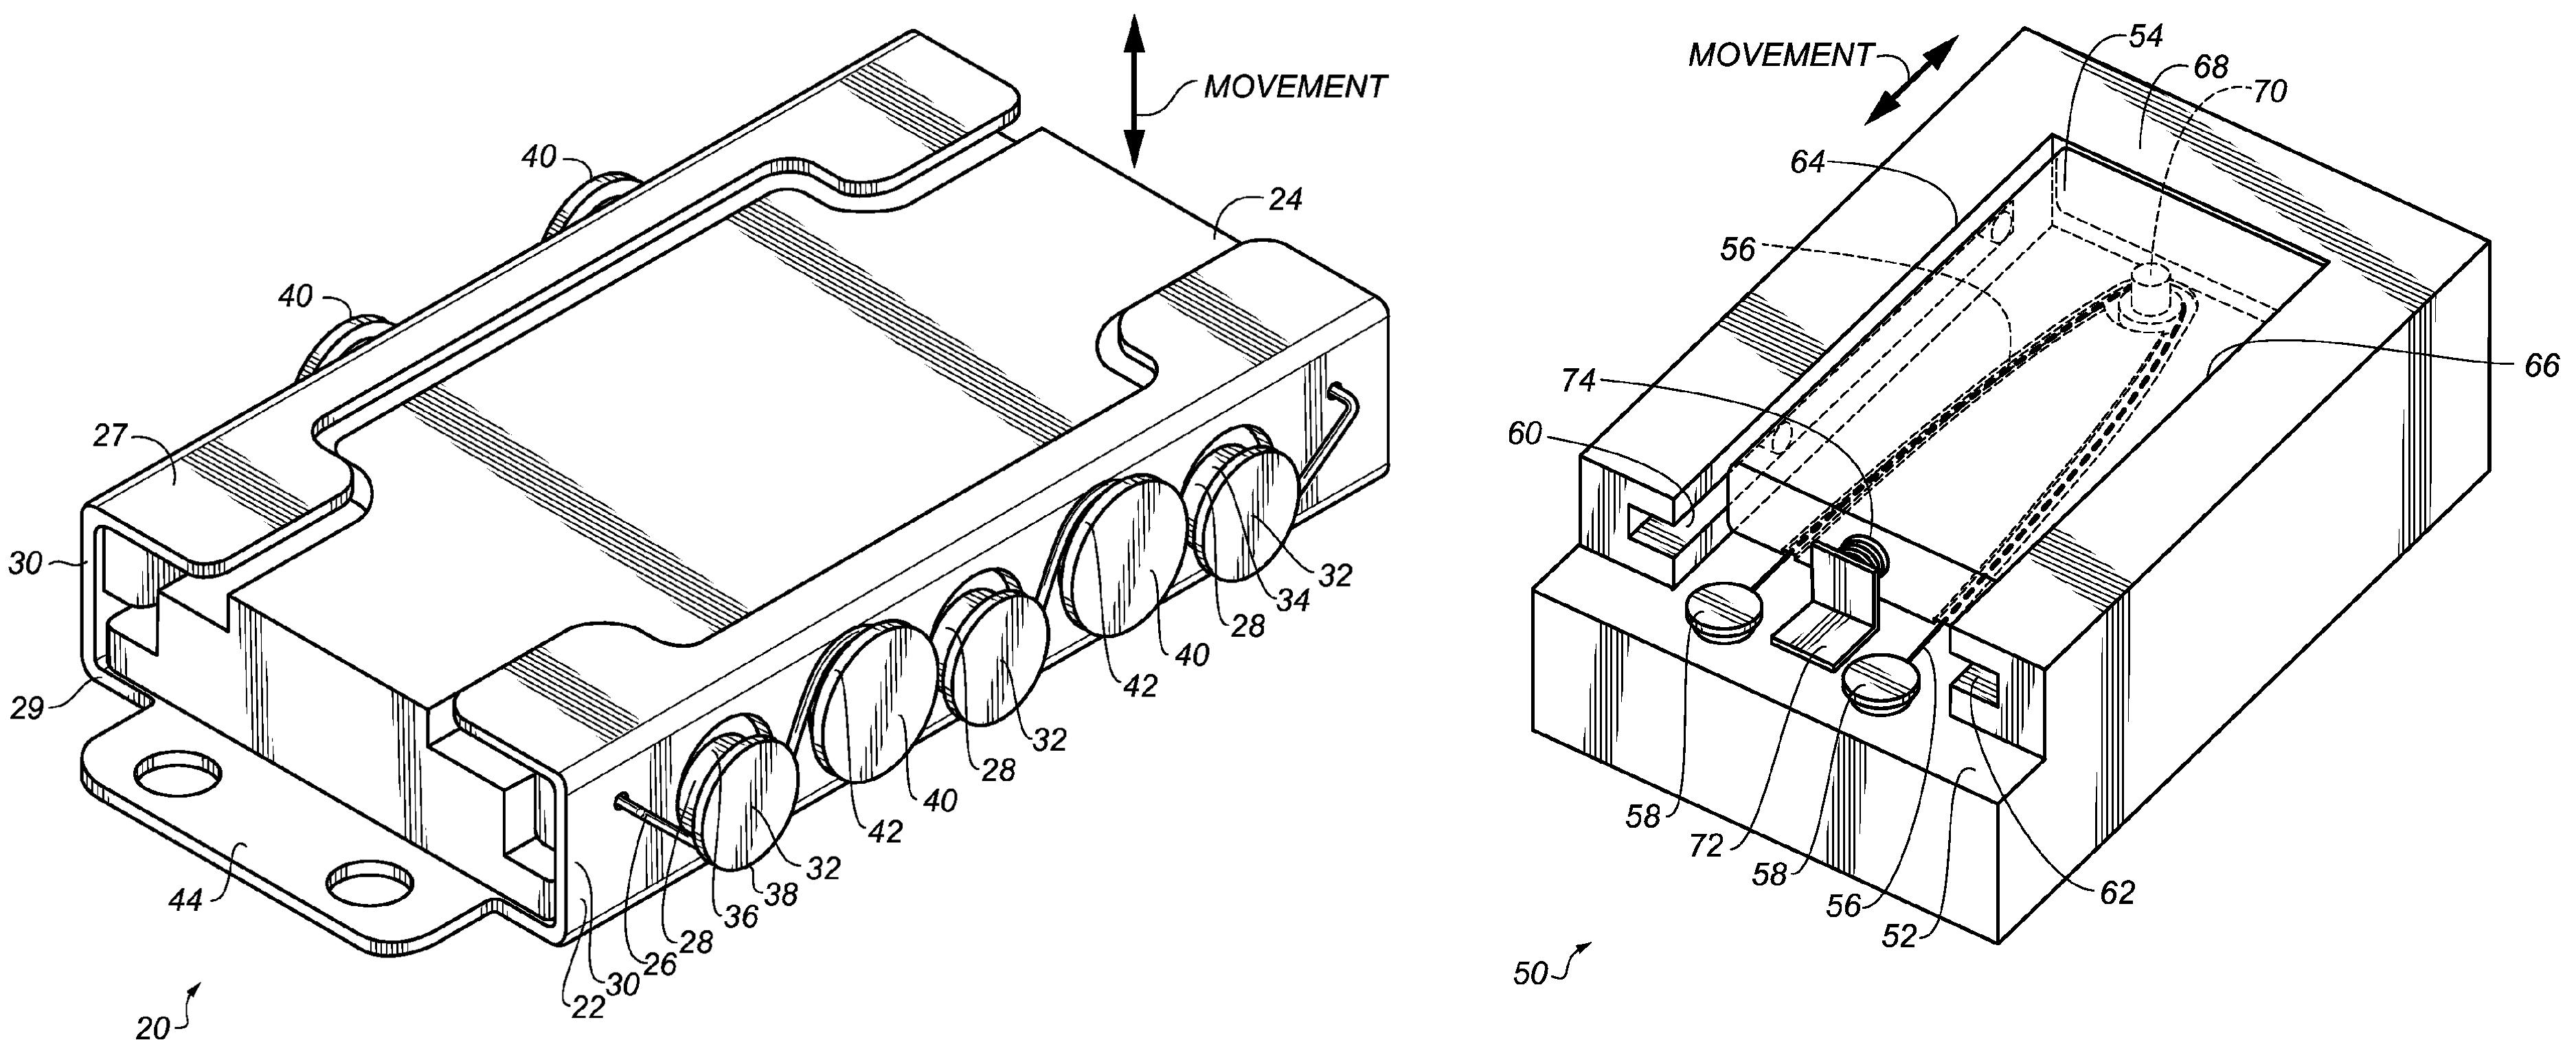 Apple patent dual haptic feedback drawing 004